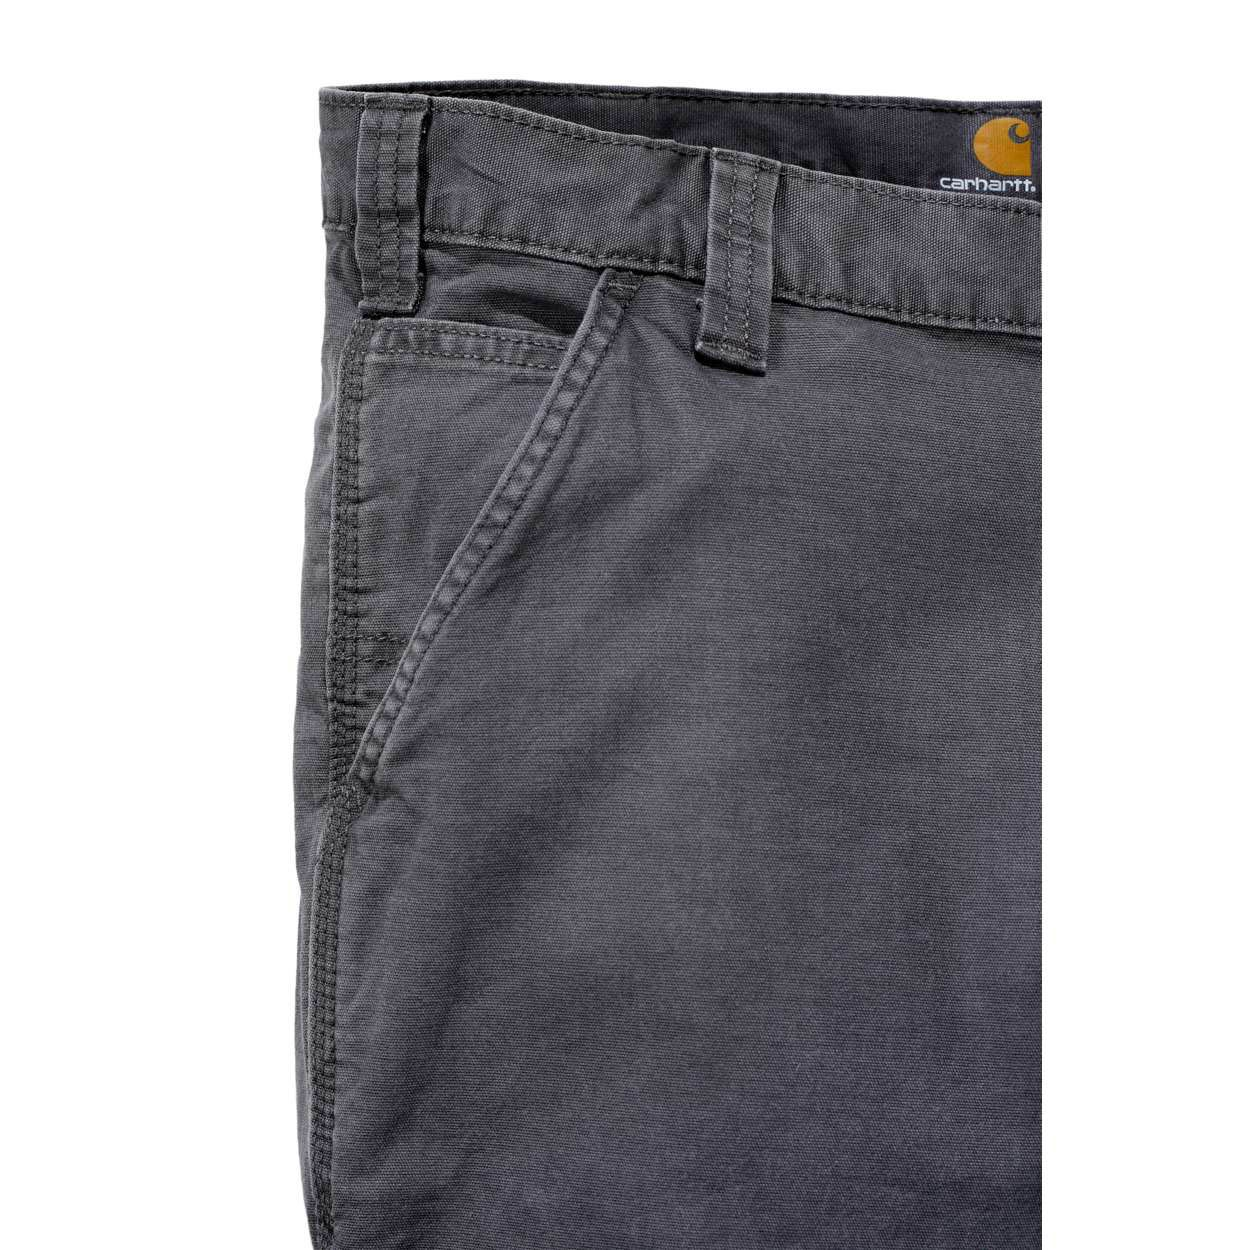 f4217bb48d3 Carhartt 102291 Rugged Flex Rigby Dungaree - Work Trousers - Workwear -  Best Workwear